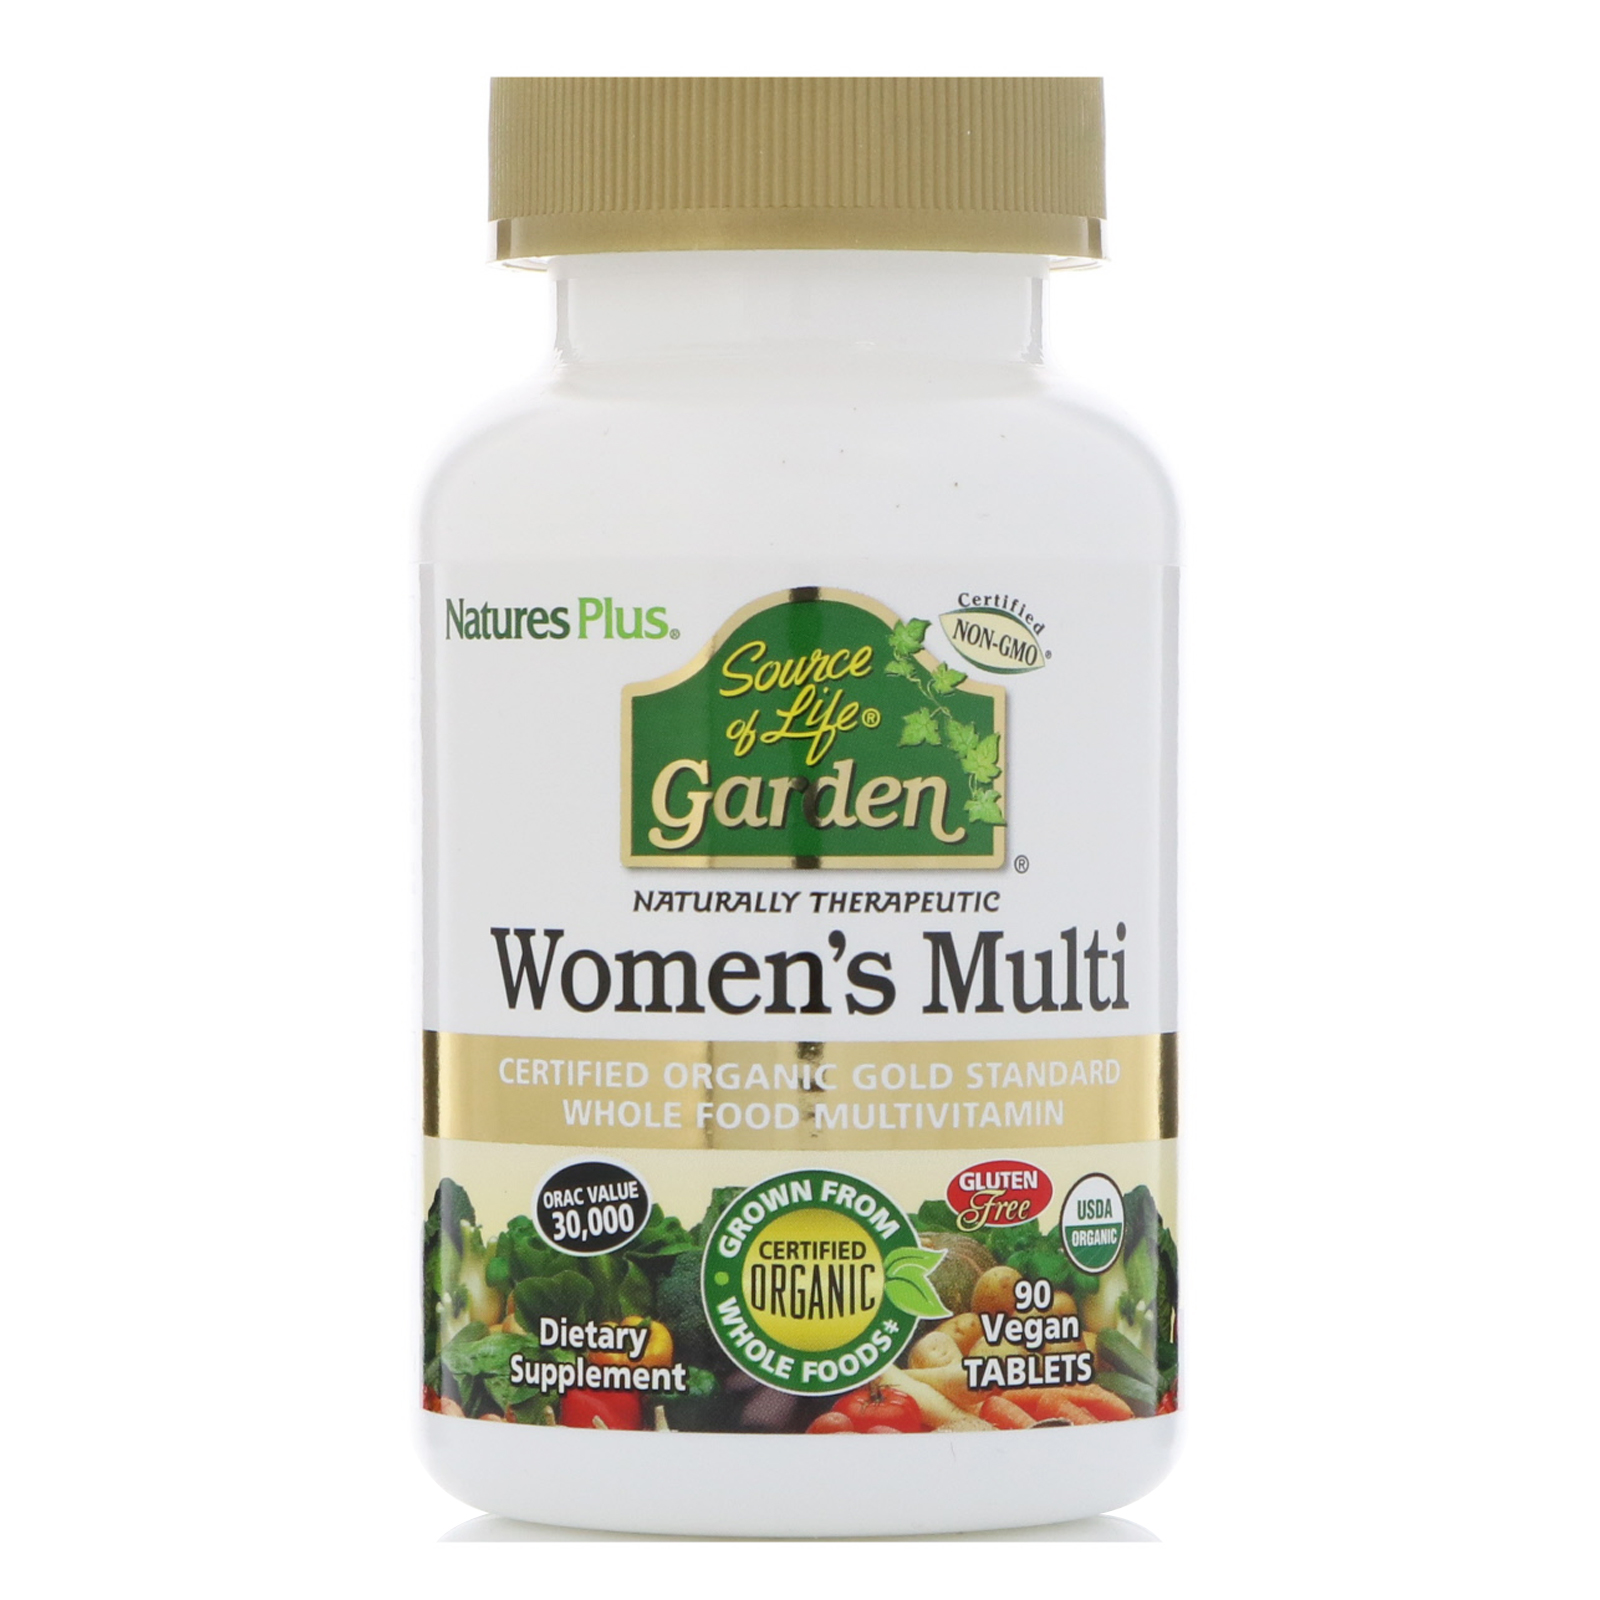 Nature 39 S Plus Source Of Life Garden Women 39 S Multi 90 Vegan Tablets